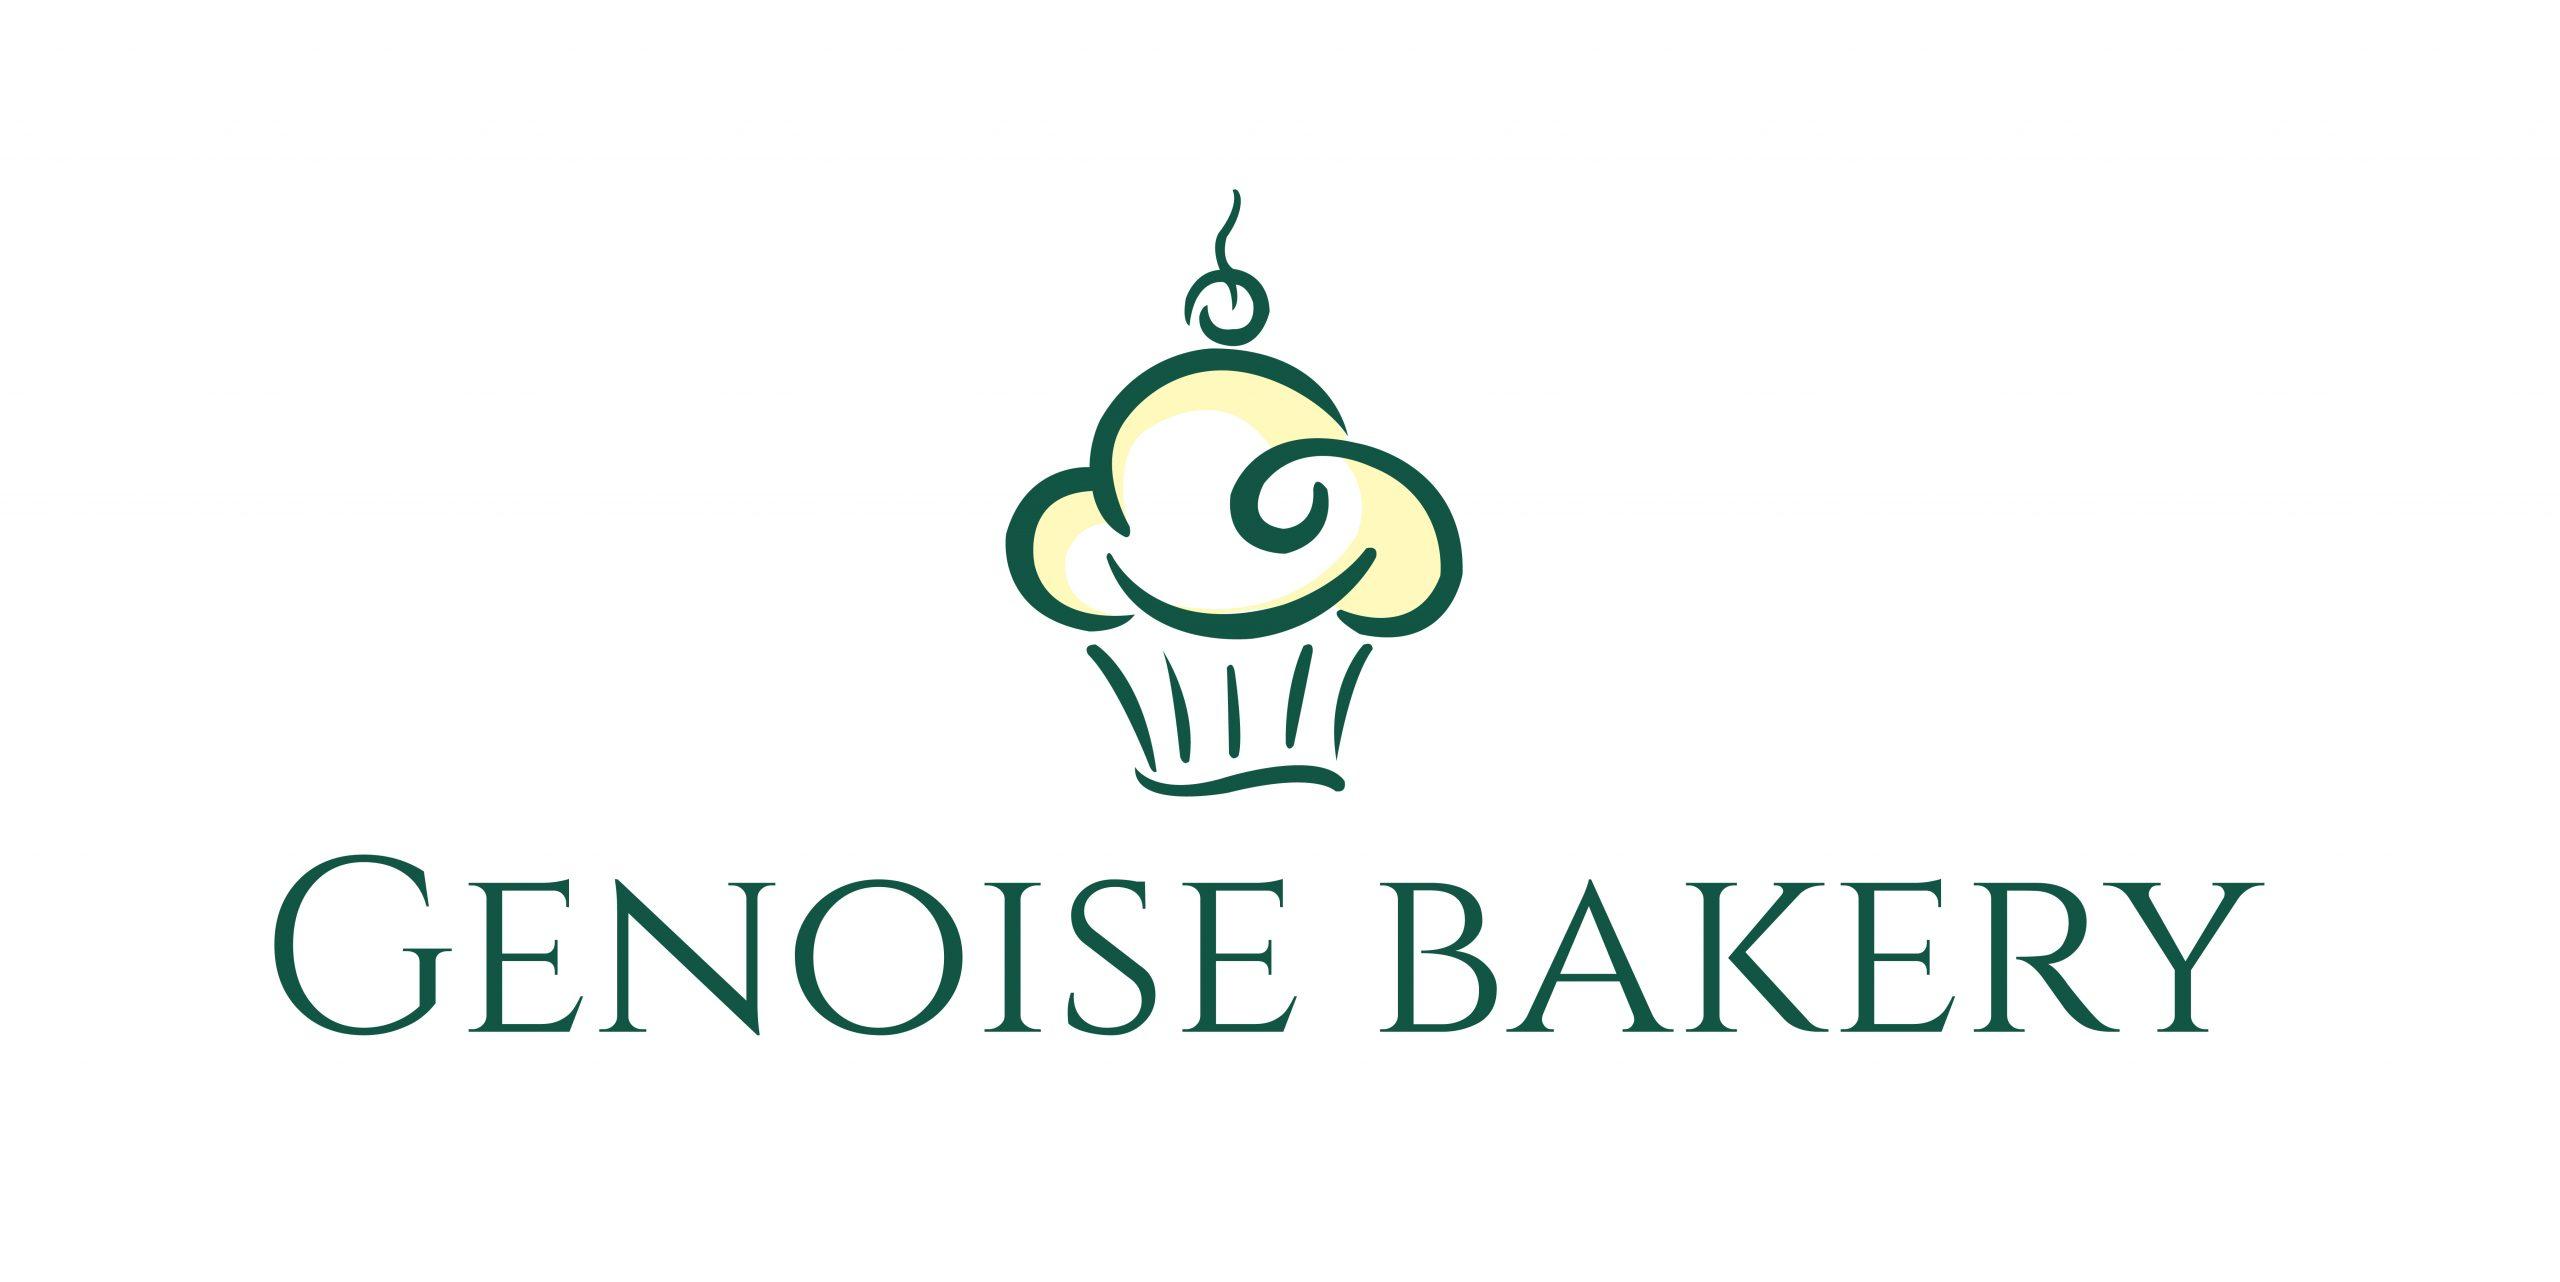 Genoise Bakery